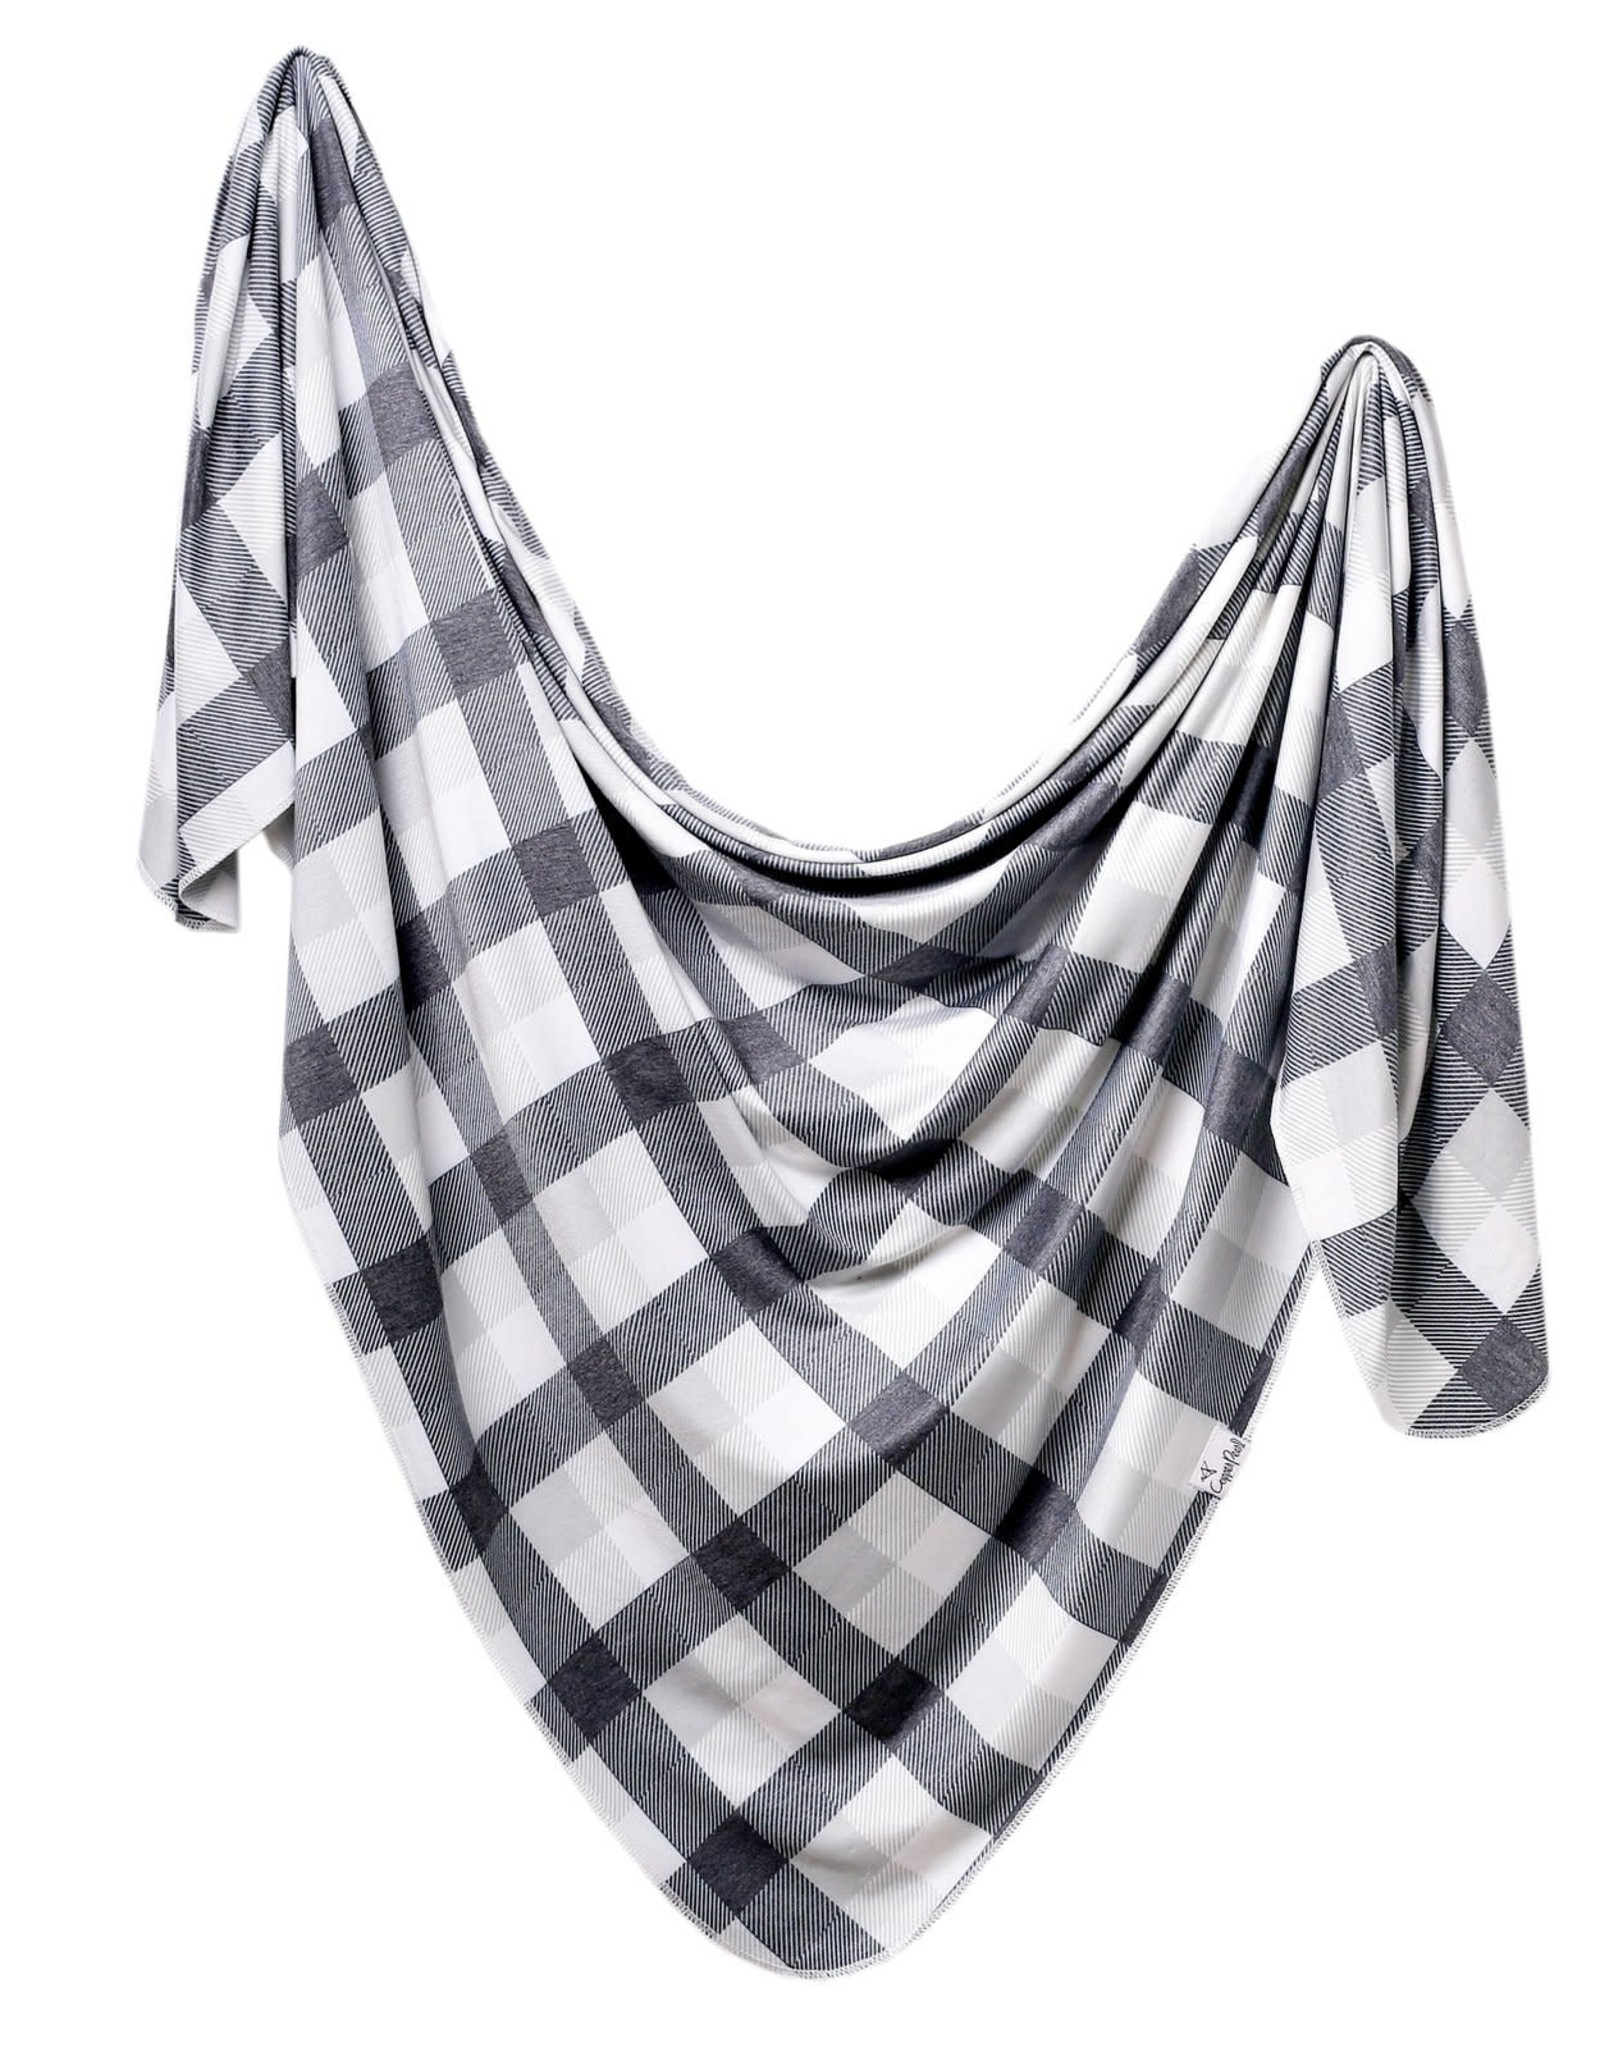 COPPER PEARL Knit Swaddle Blanket HUDSON